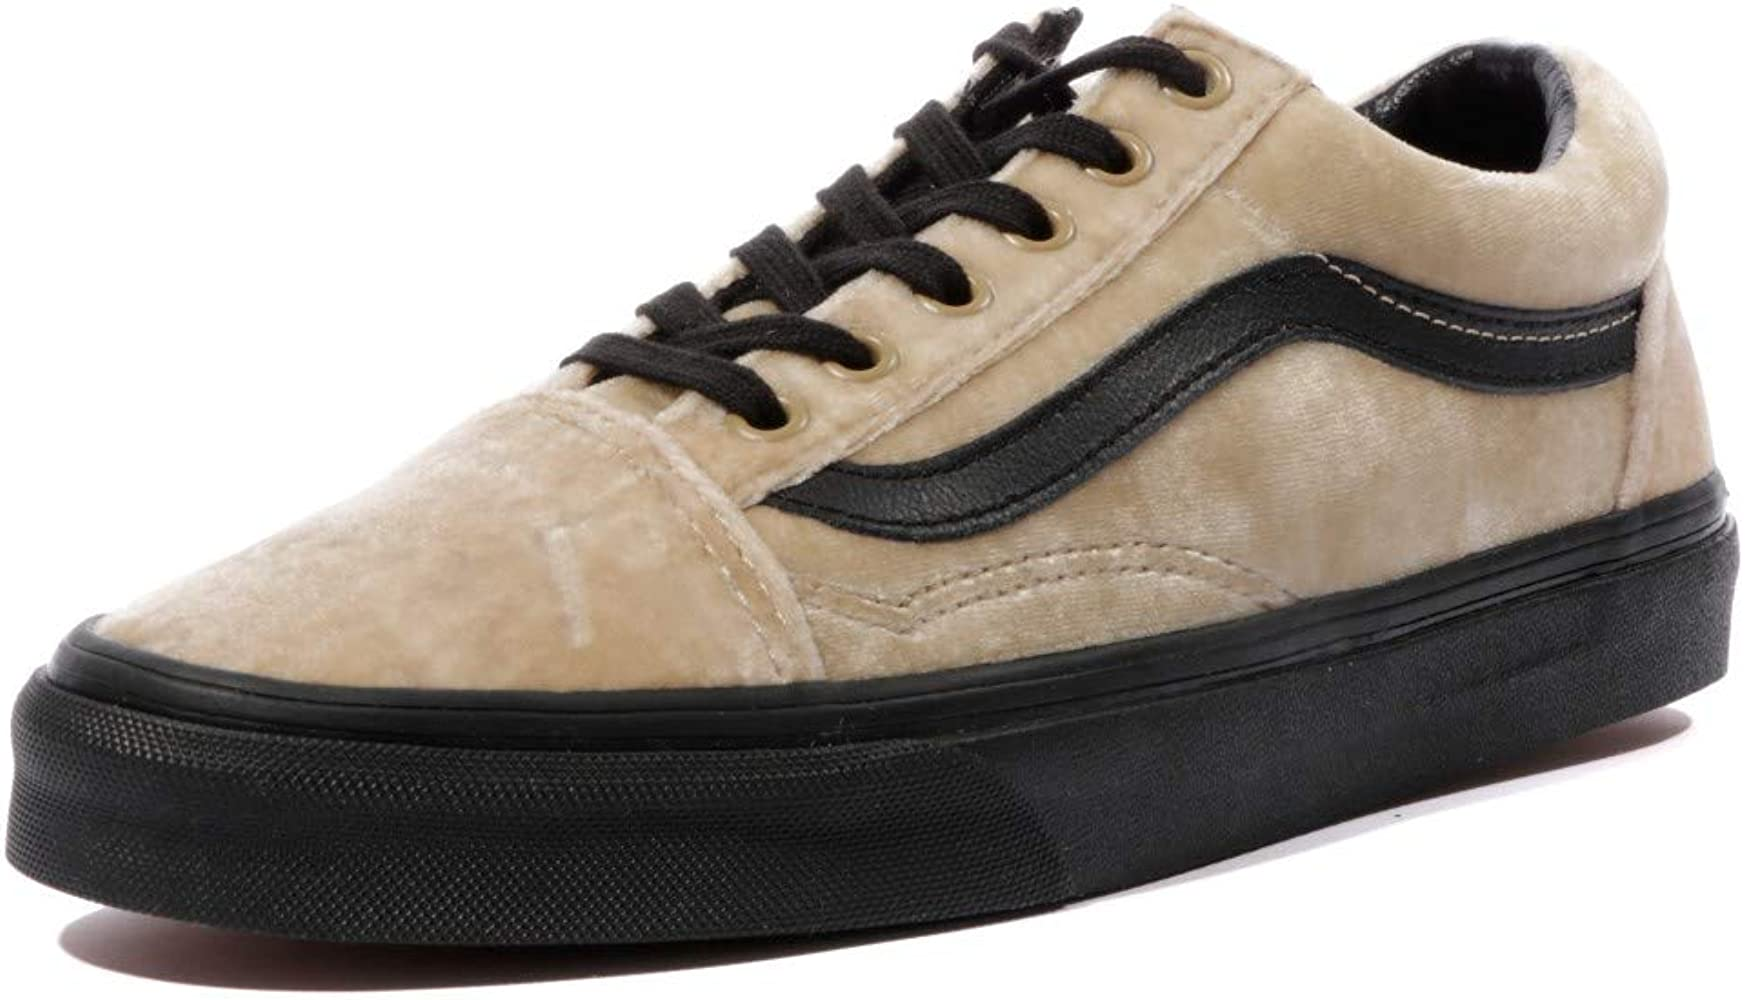 Vans Old Skool (Velvet) Tan